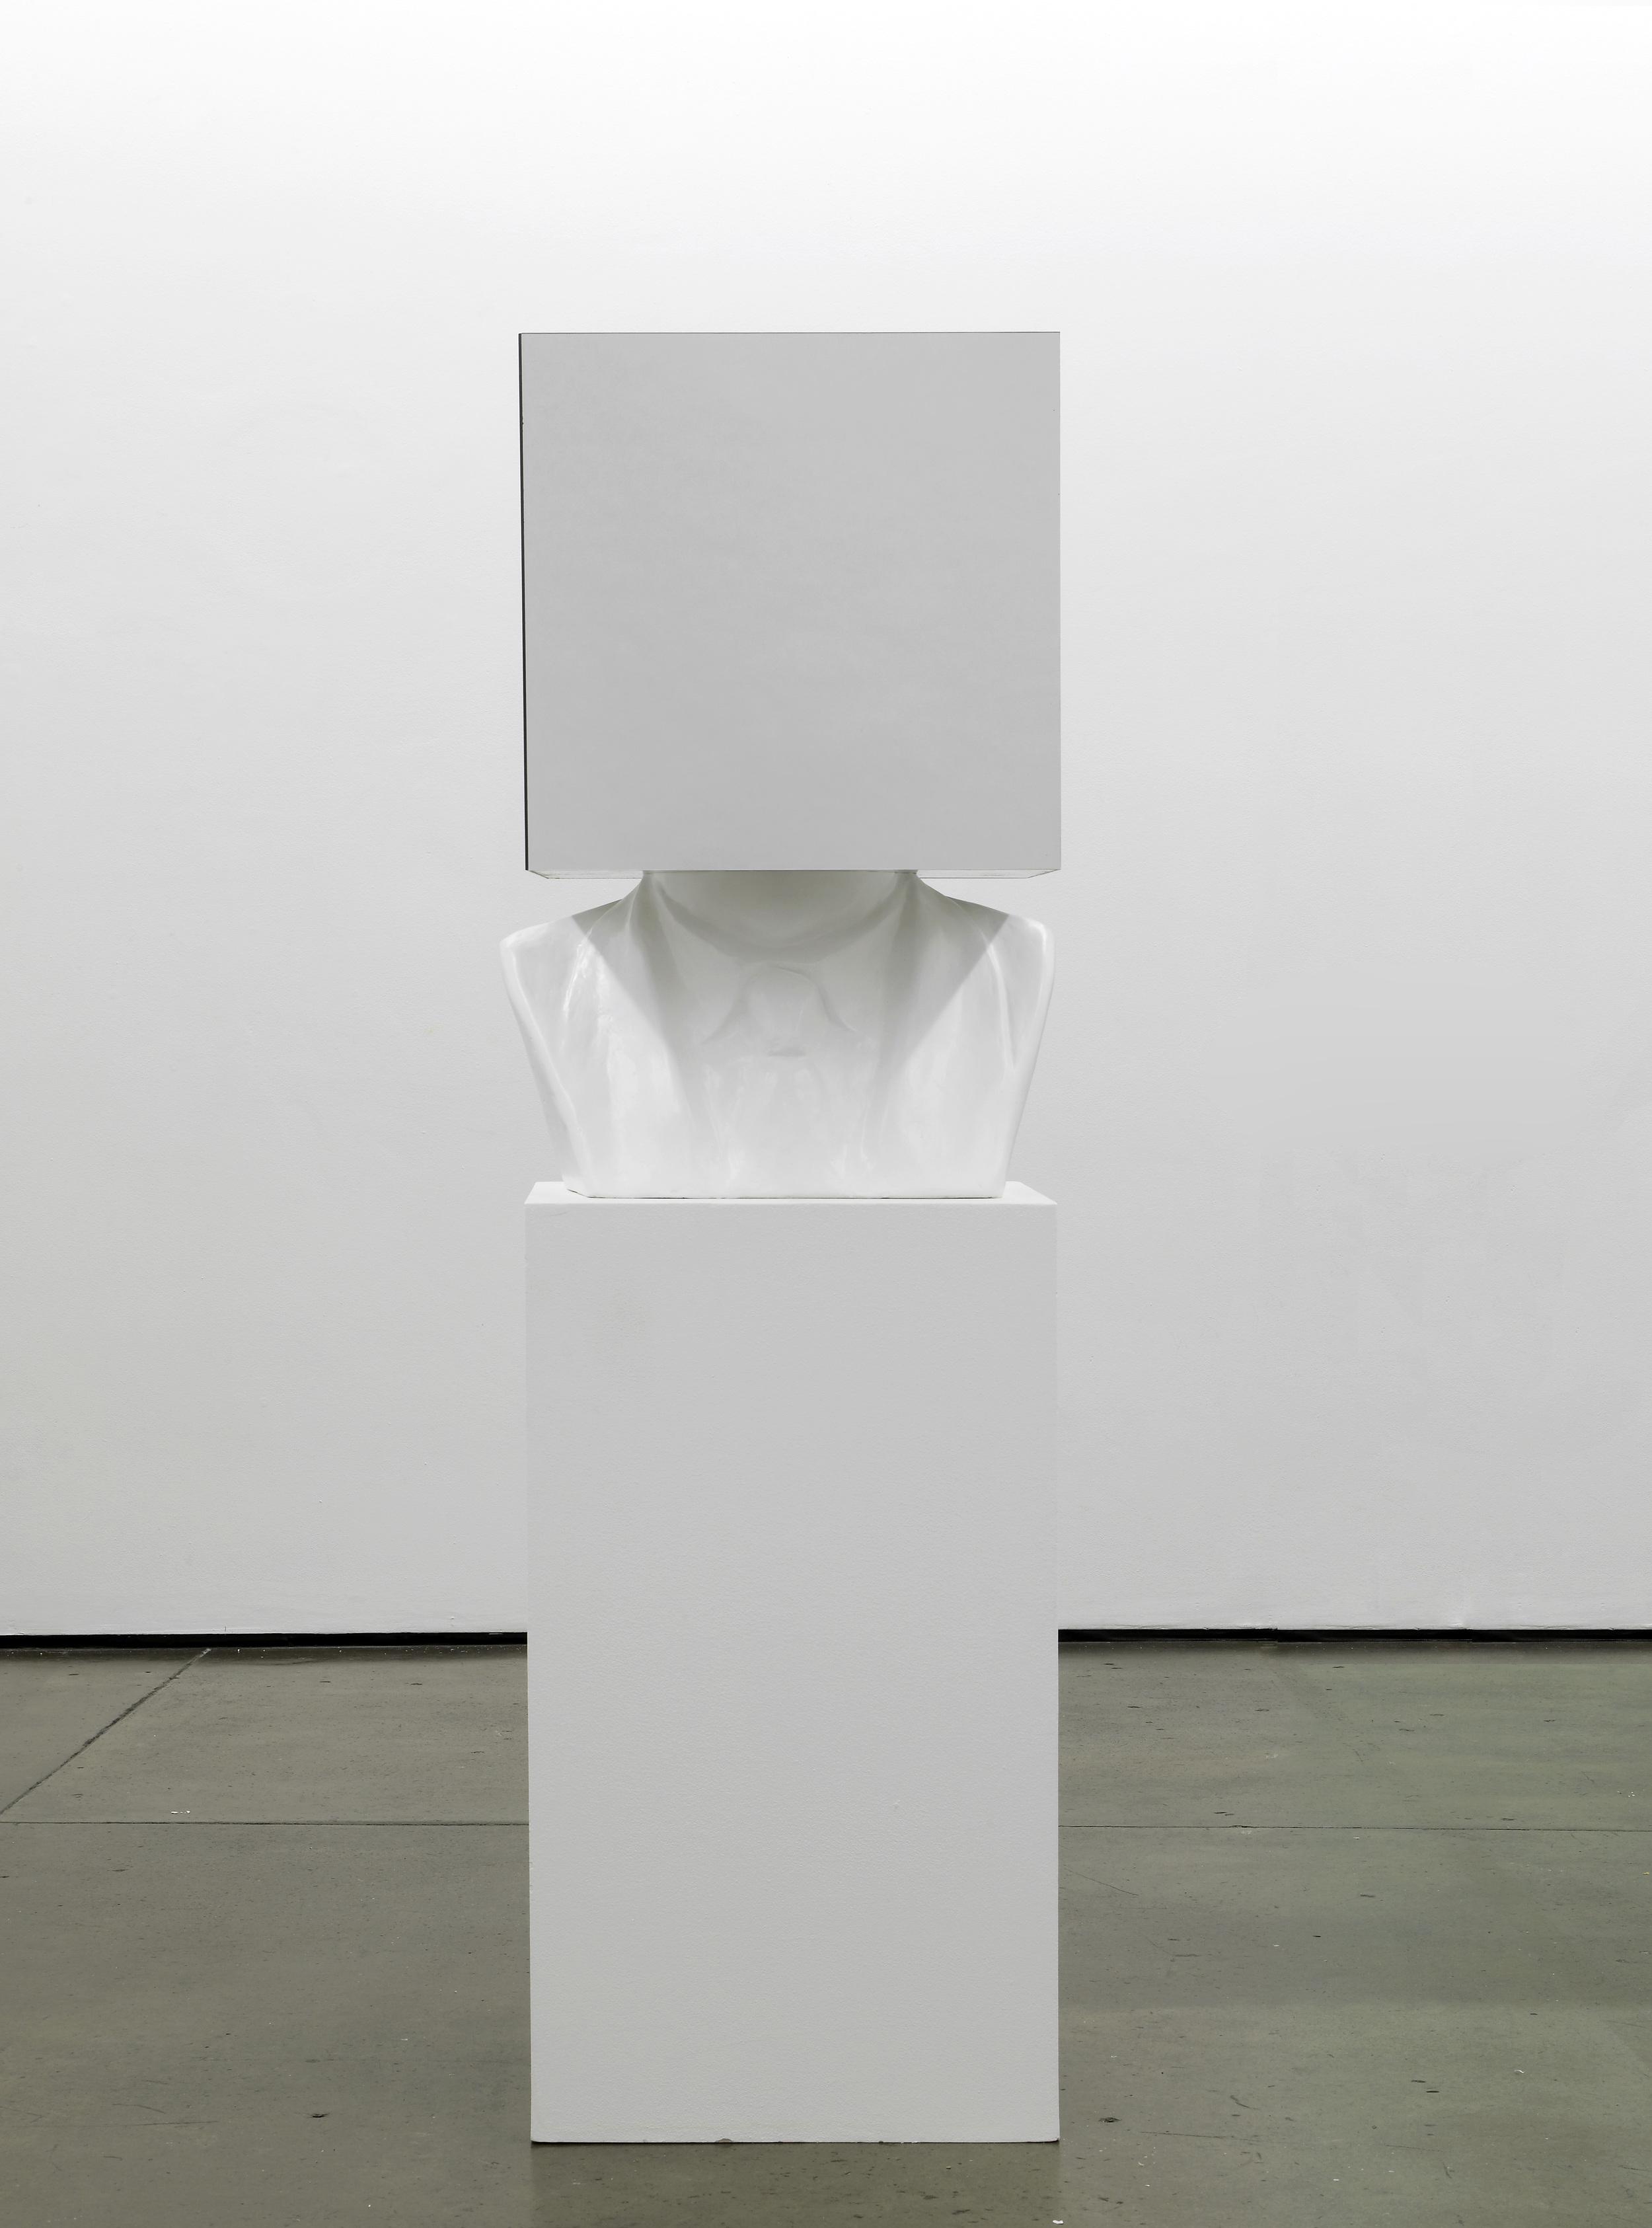 Sol LeWitt, Paragraphs on Conceptual Art, 1967  2012  Plaster bust, mirror, plinth 173 x 57 x 50 cm / 68 x 22.5 x 20 in